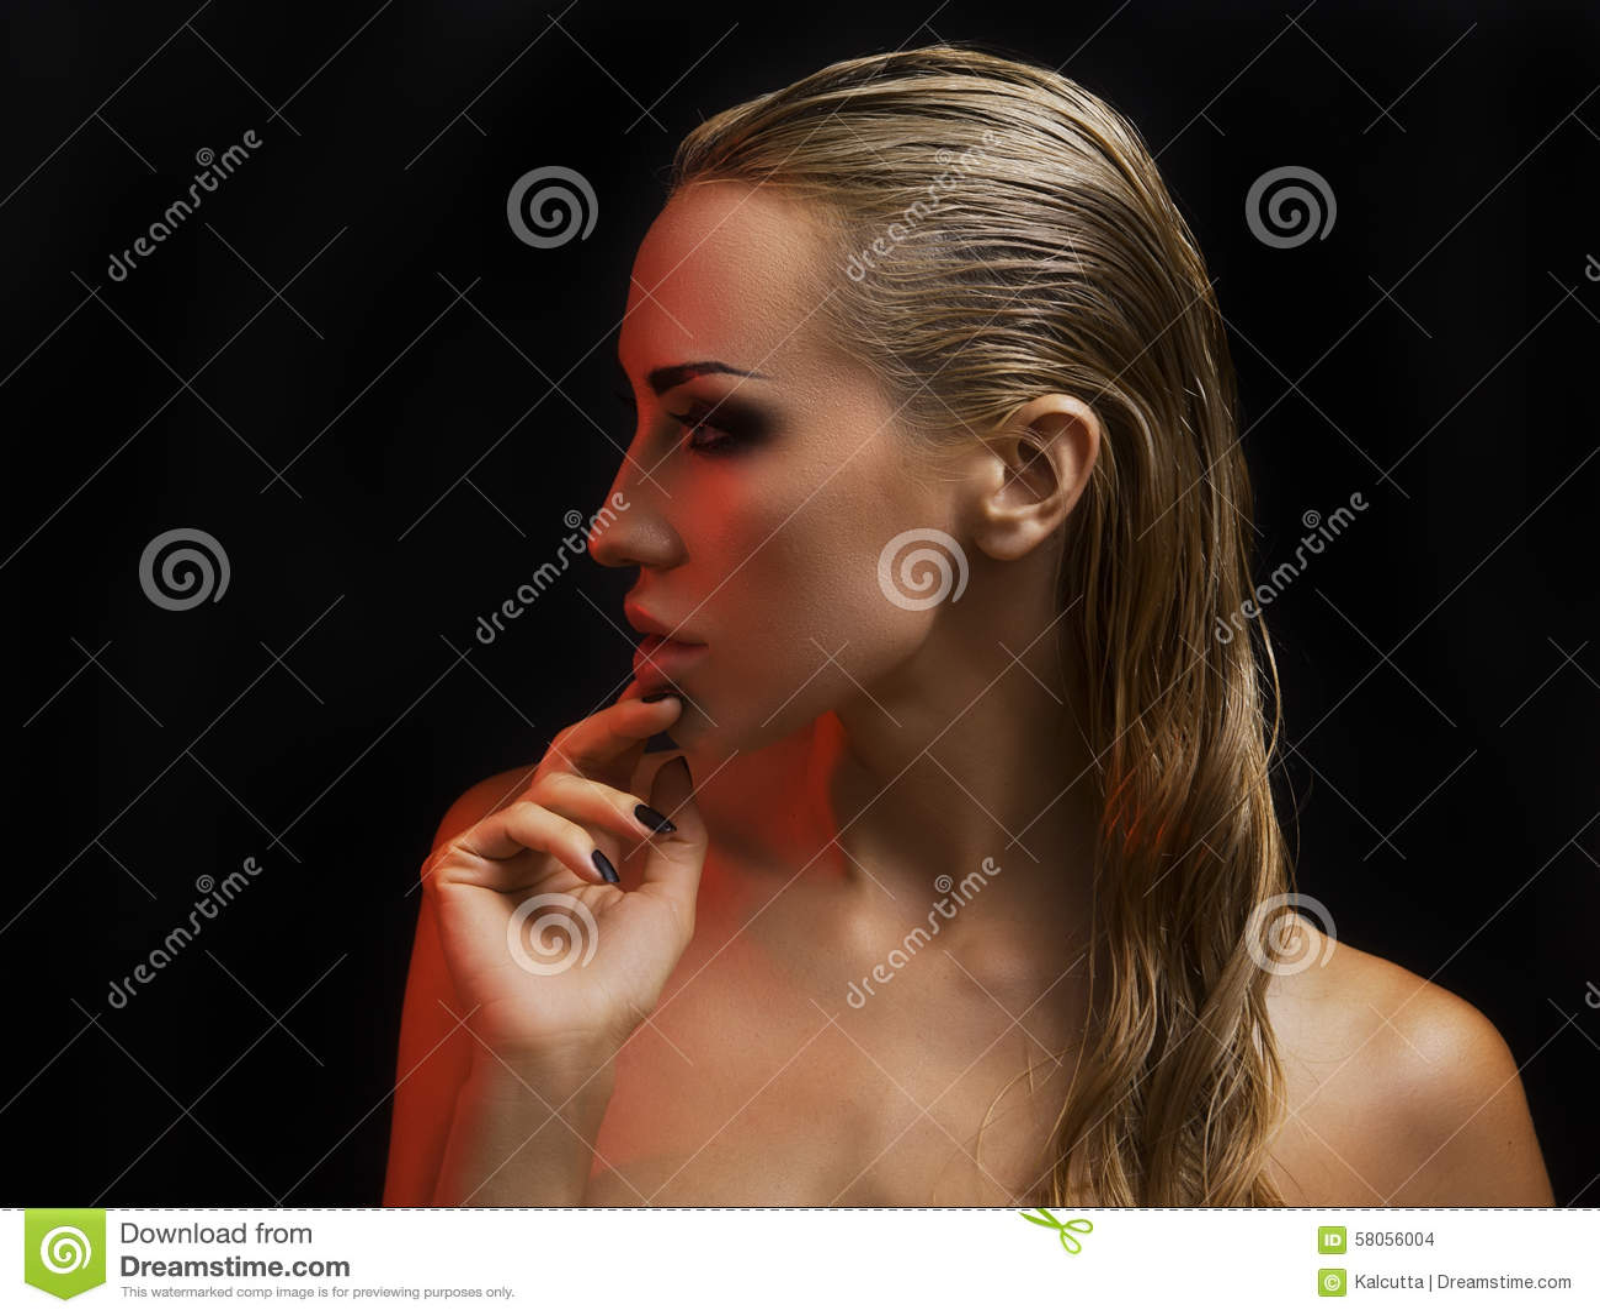 Bella donna bionda sexy Fondo scuro Smokey Eyes intelligente